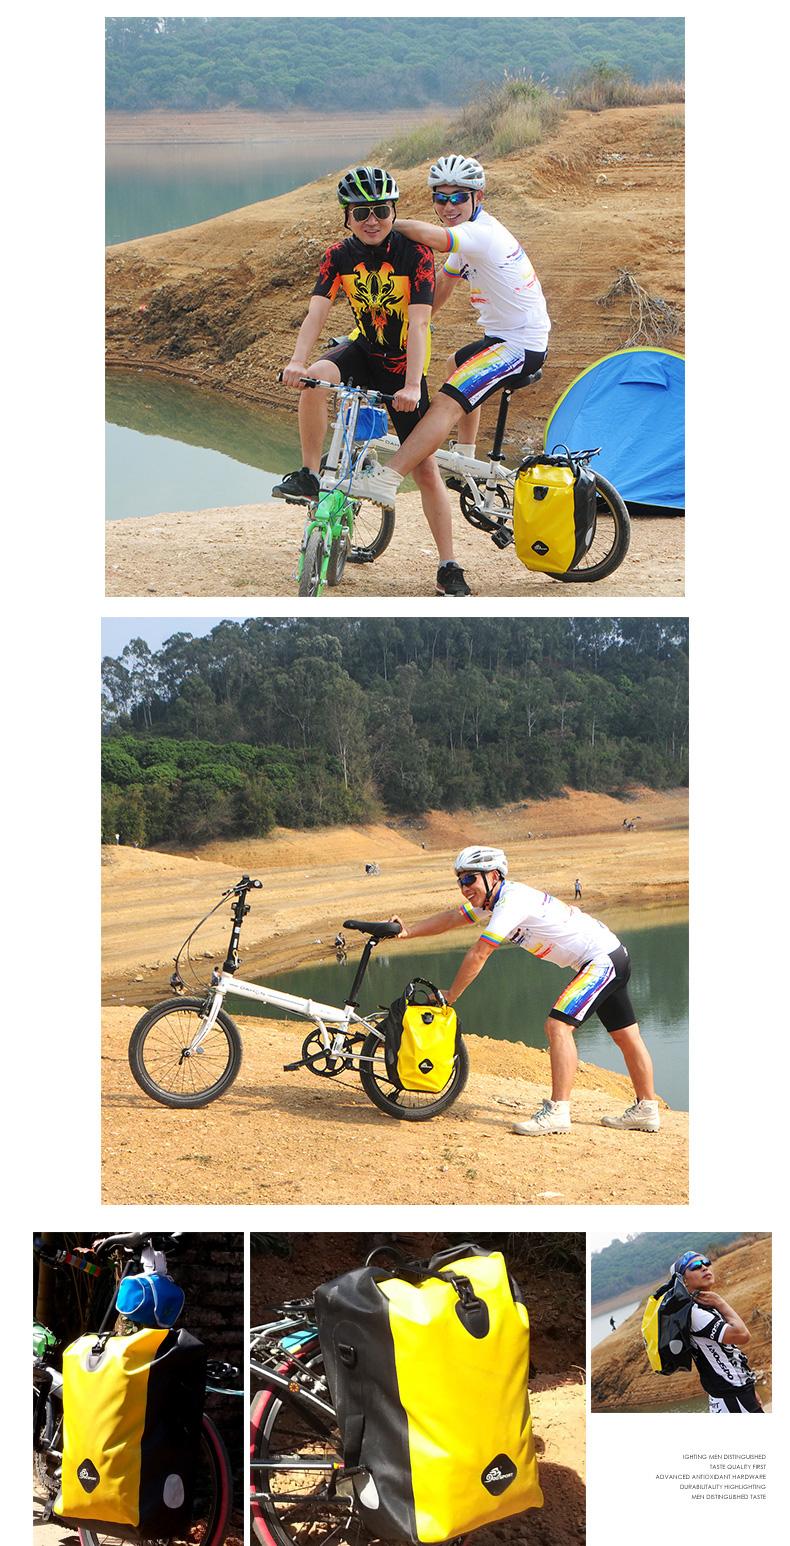 vodonepronicaemaja sumka shtany na bagazhnik velosipeda velobaul oqsport 23 - Водонепроницаемая сумка-штаны на багажник велосипеда (велобаул) OQsport: двойная и одинарная (25 л) модели, IPX5